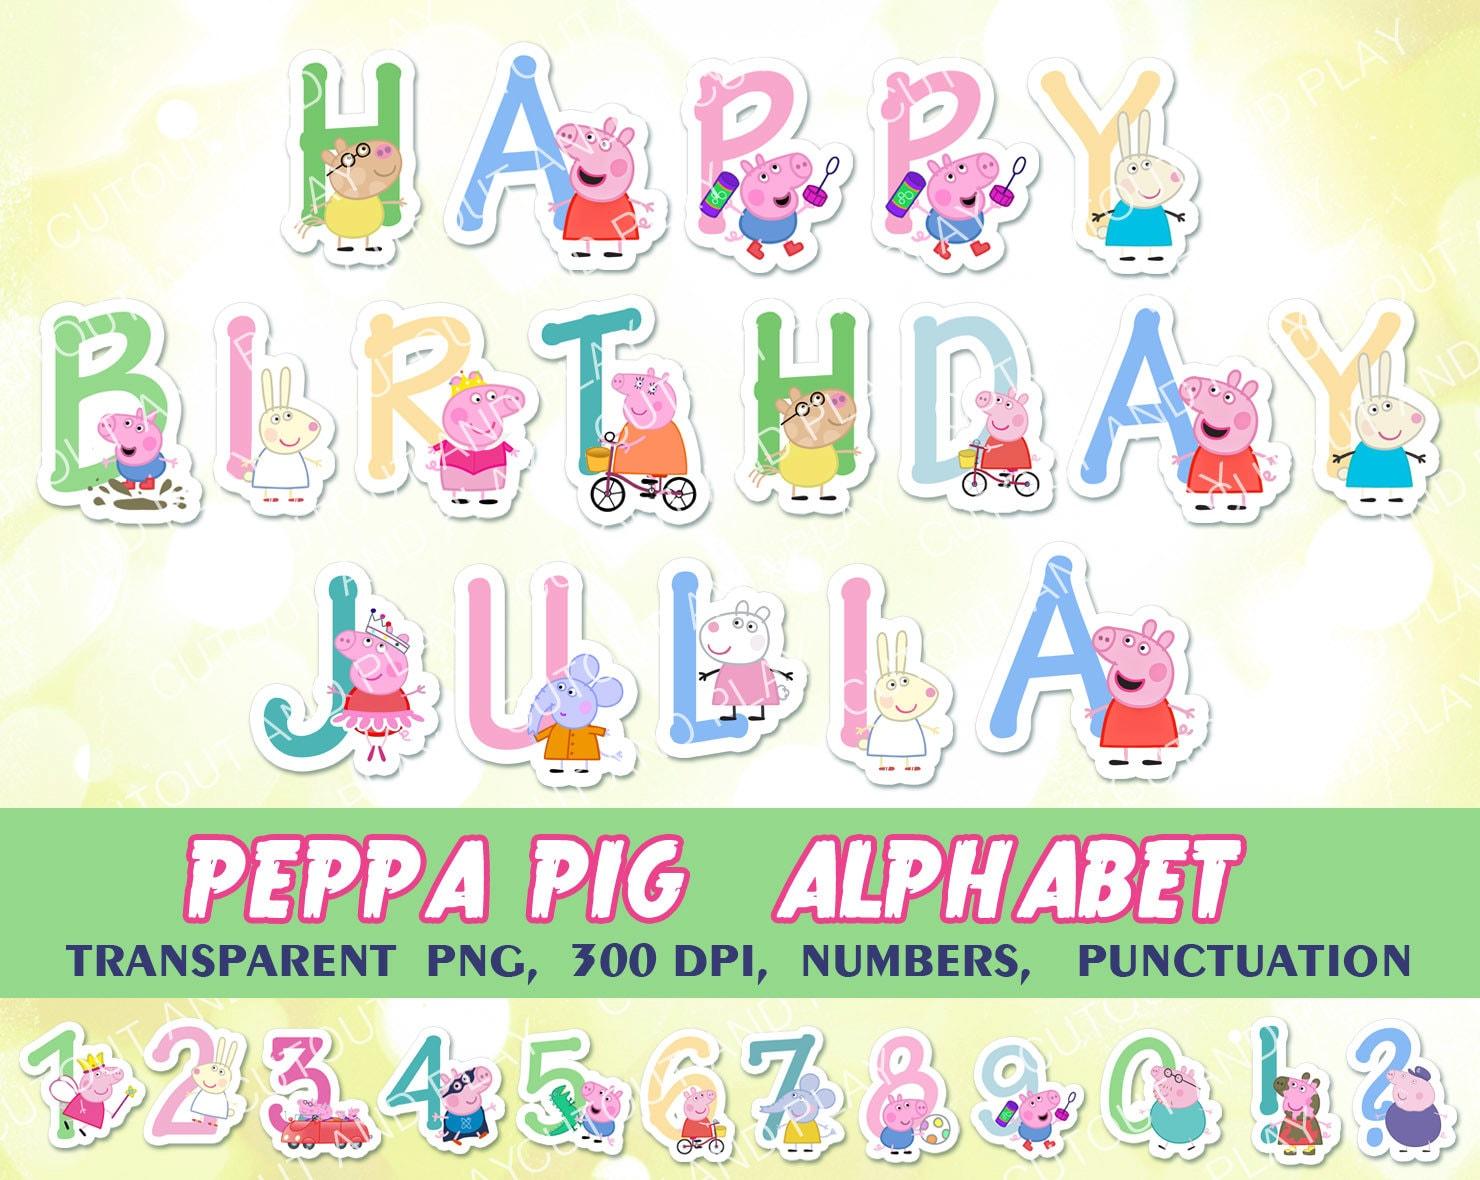 Peppa Pig Alphabet clipart Peppa pig birthday banner